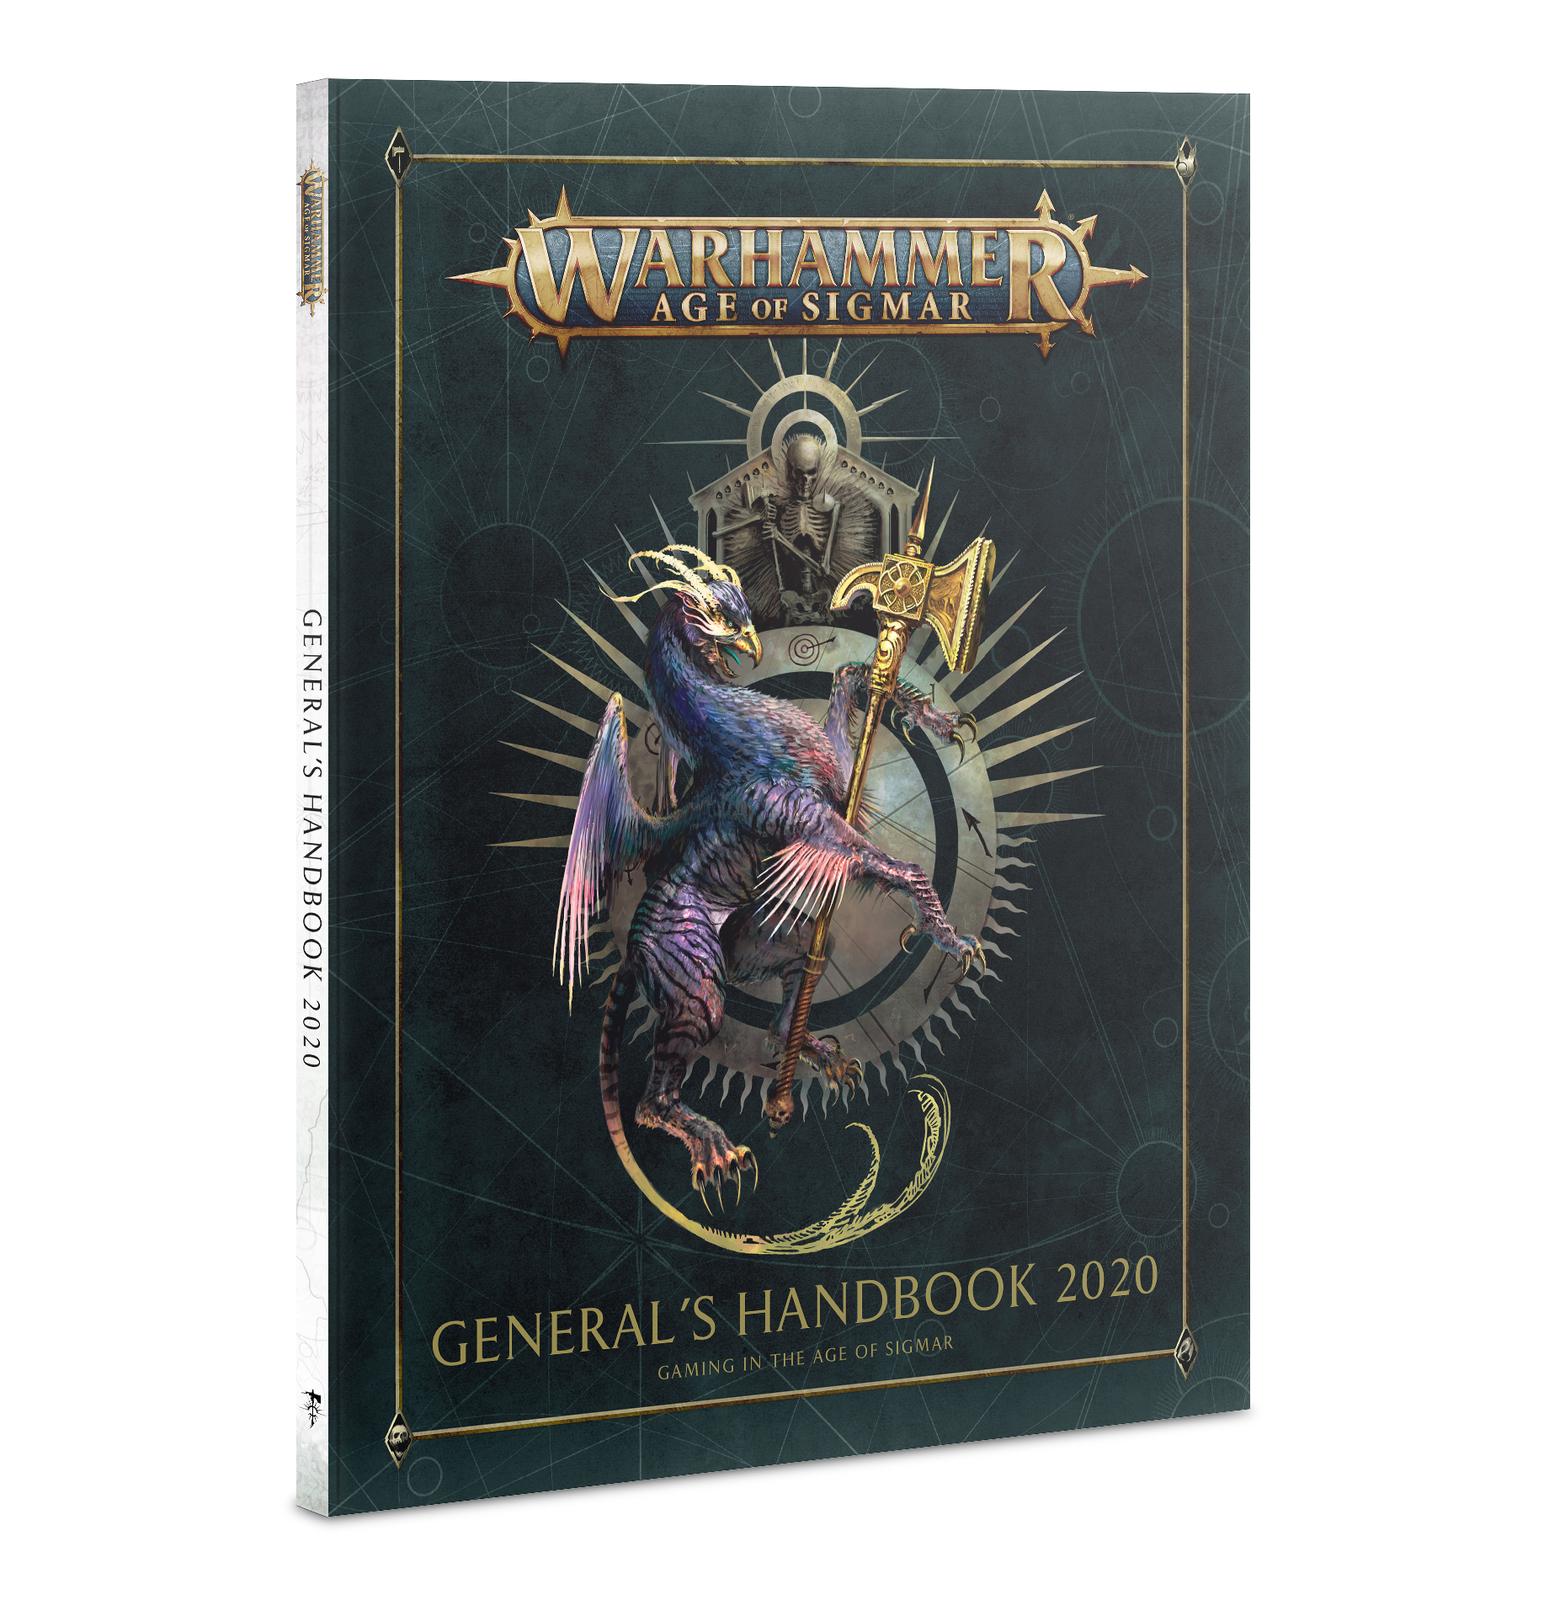 Warhammer Age of Sigmar: General's Handbook (2020) image